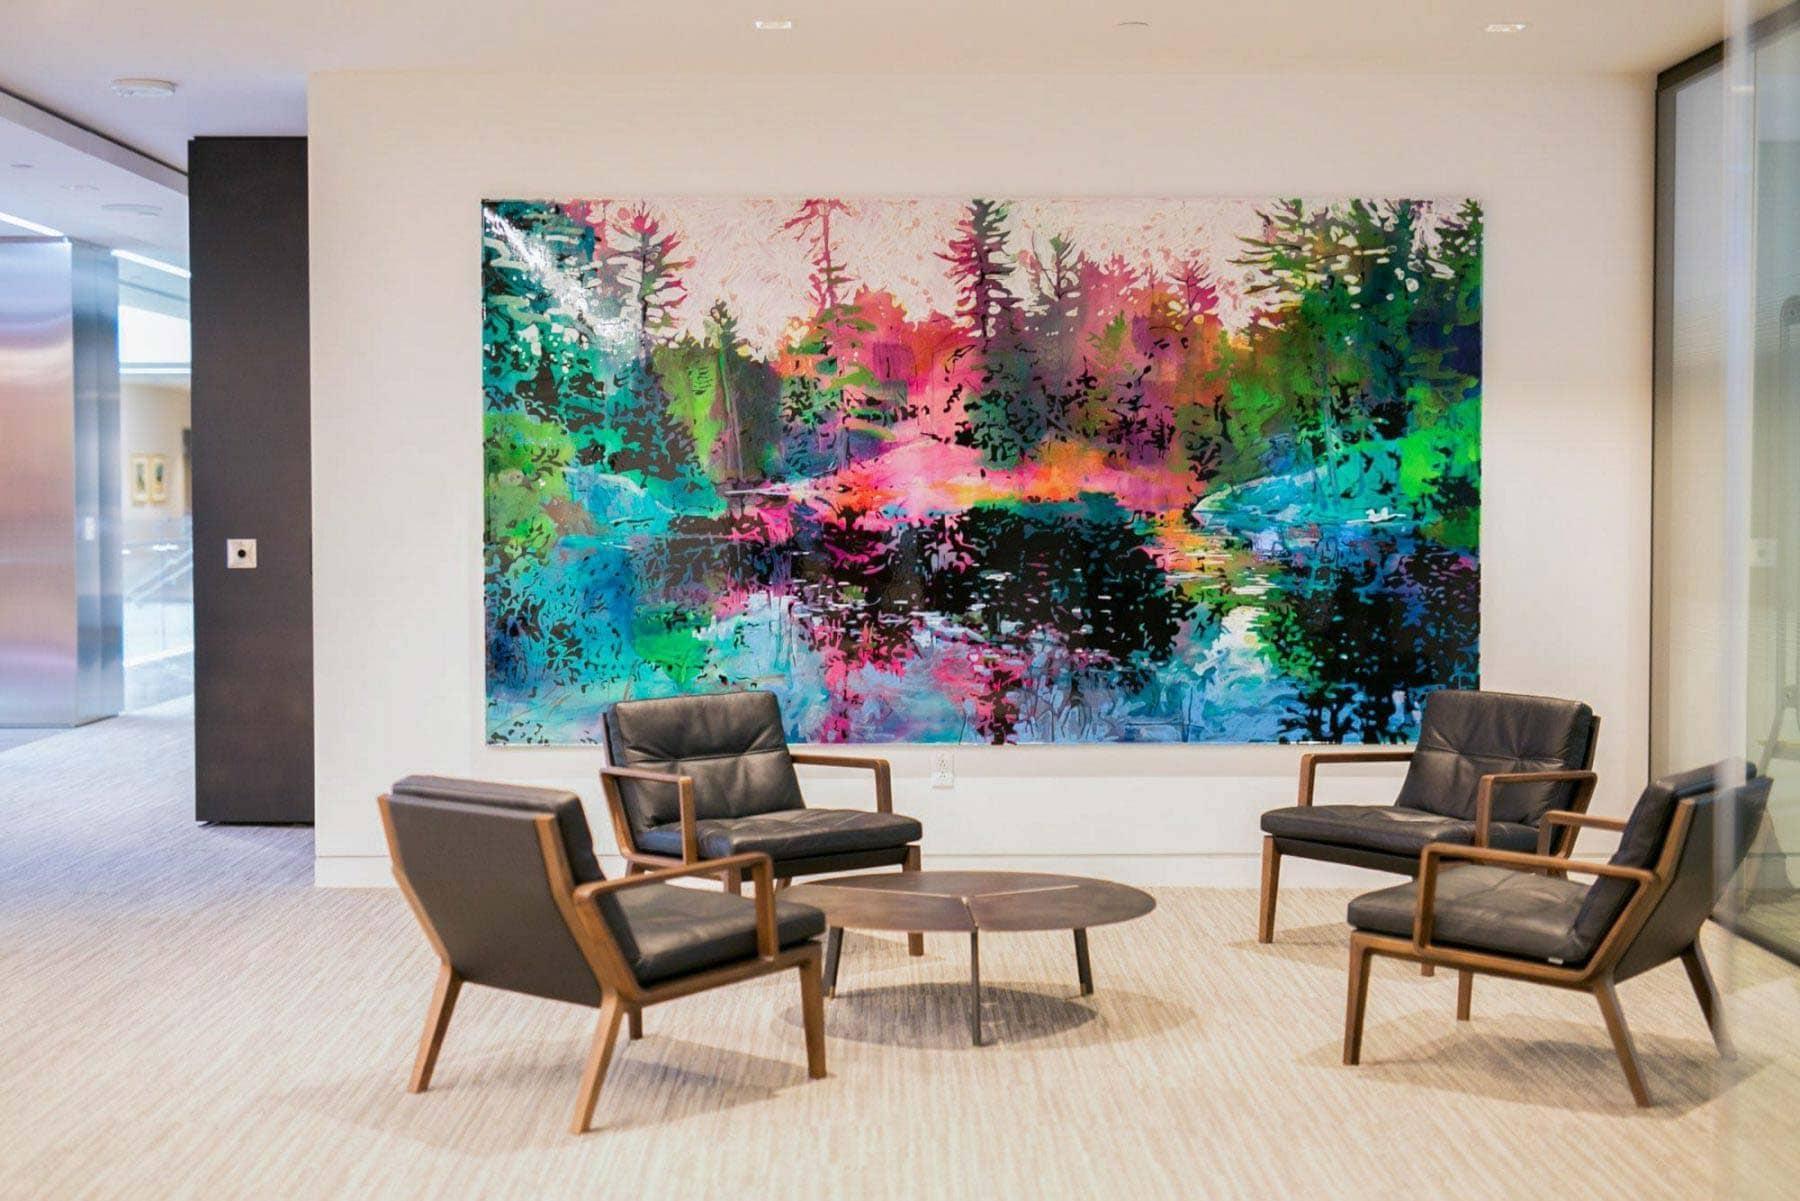 Deloitte National Headquarters | Corporate Fine Art Collection | Tap Regarding Corporate Wall Art (Image 9 of 20)